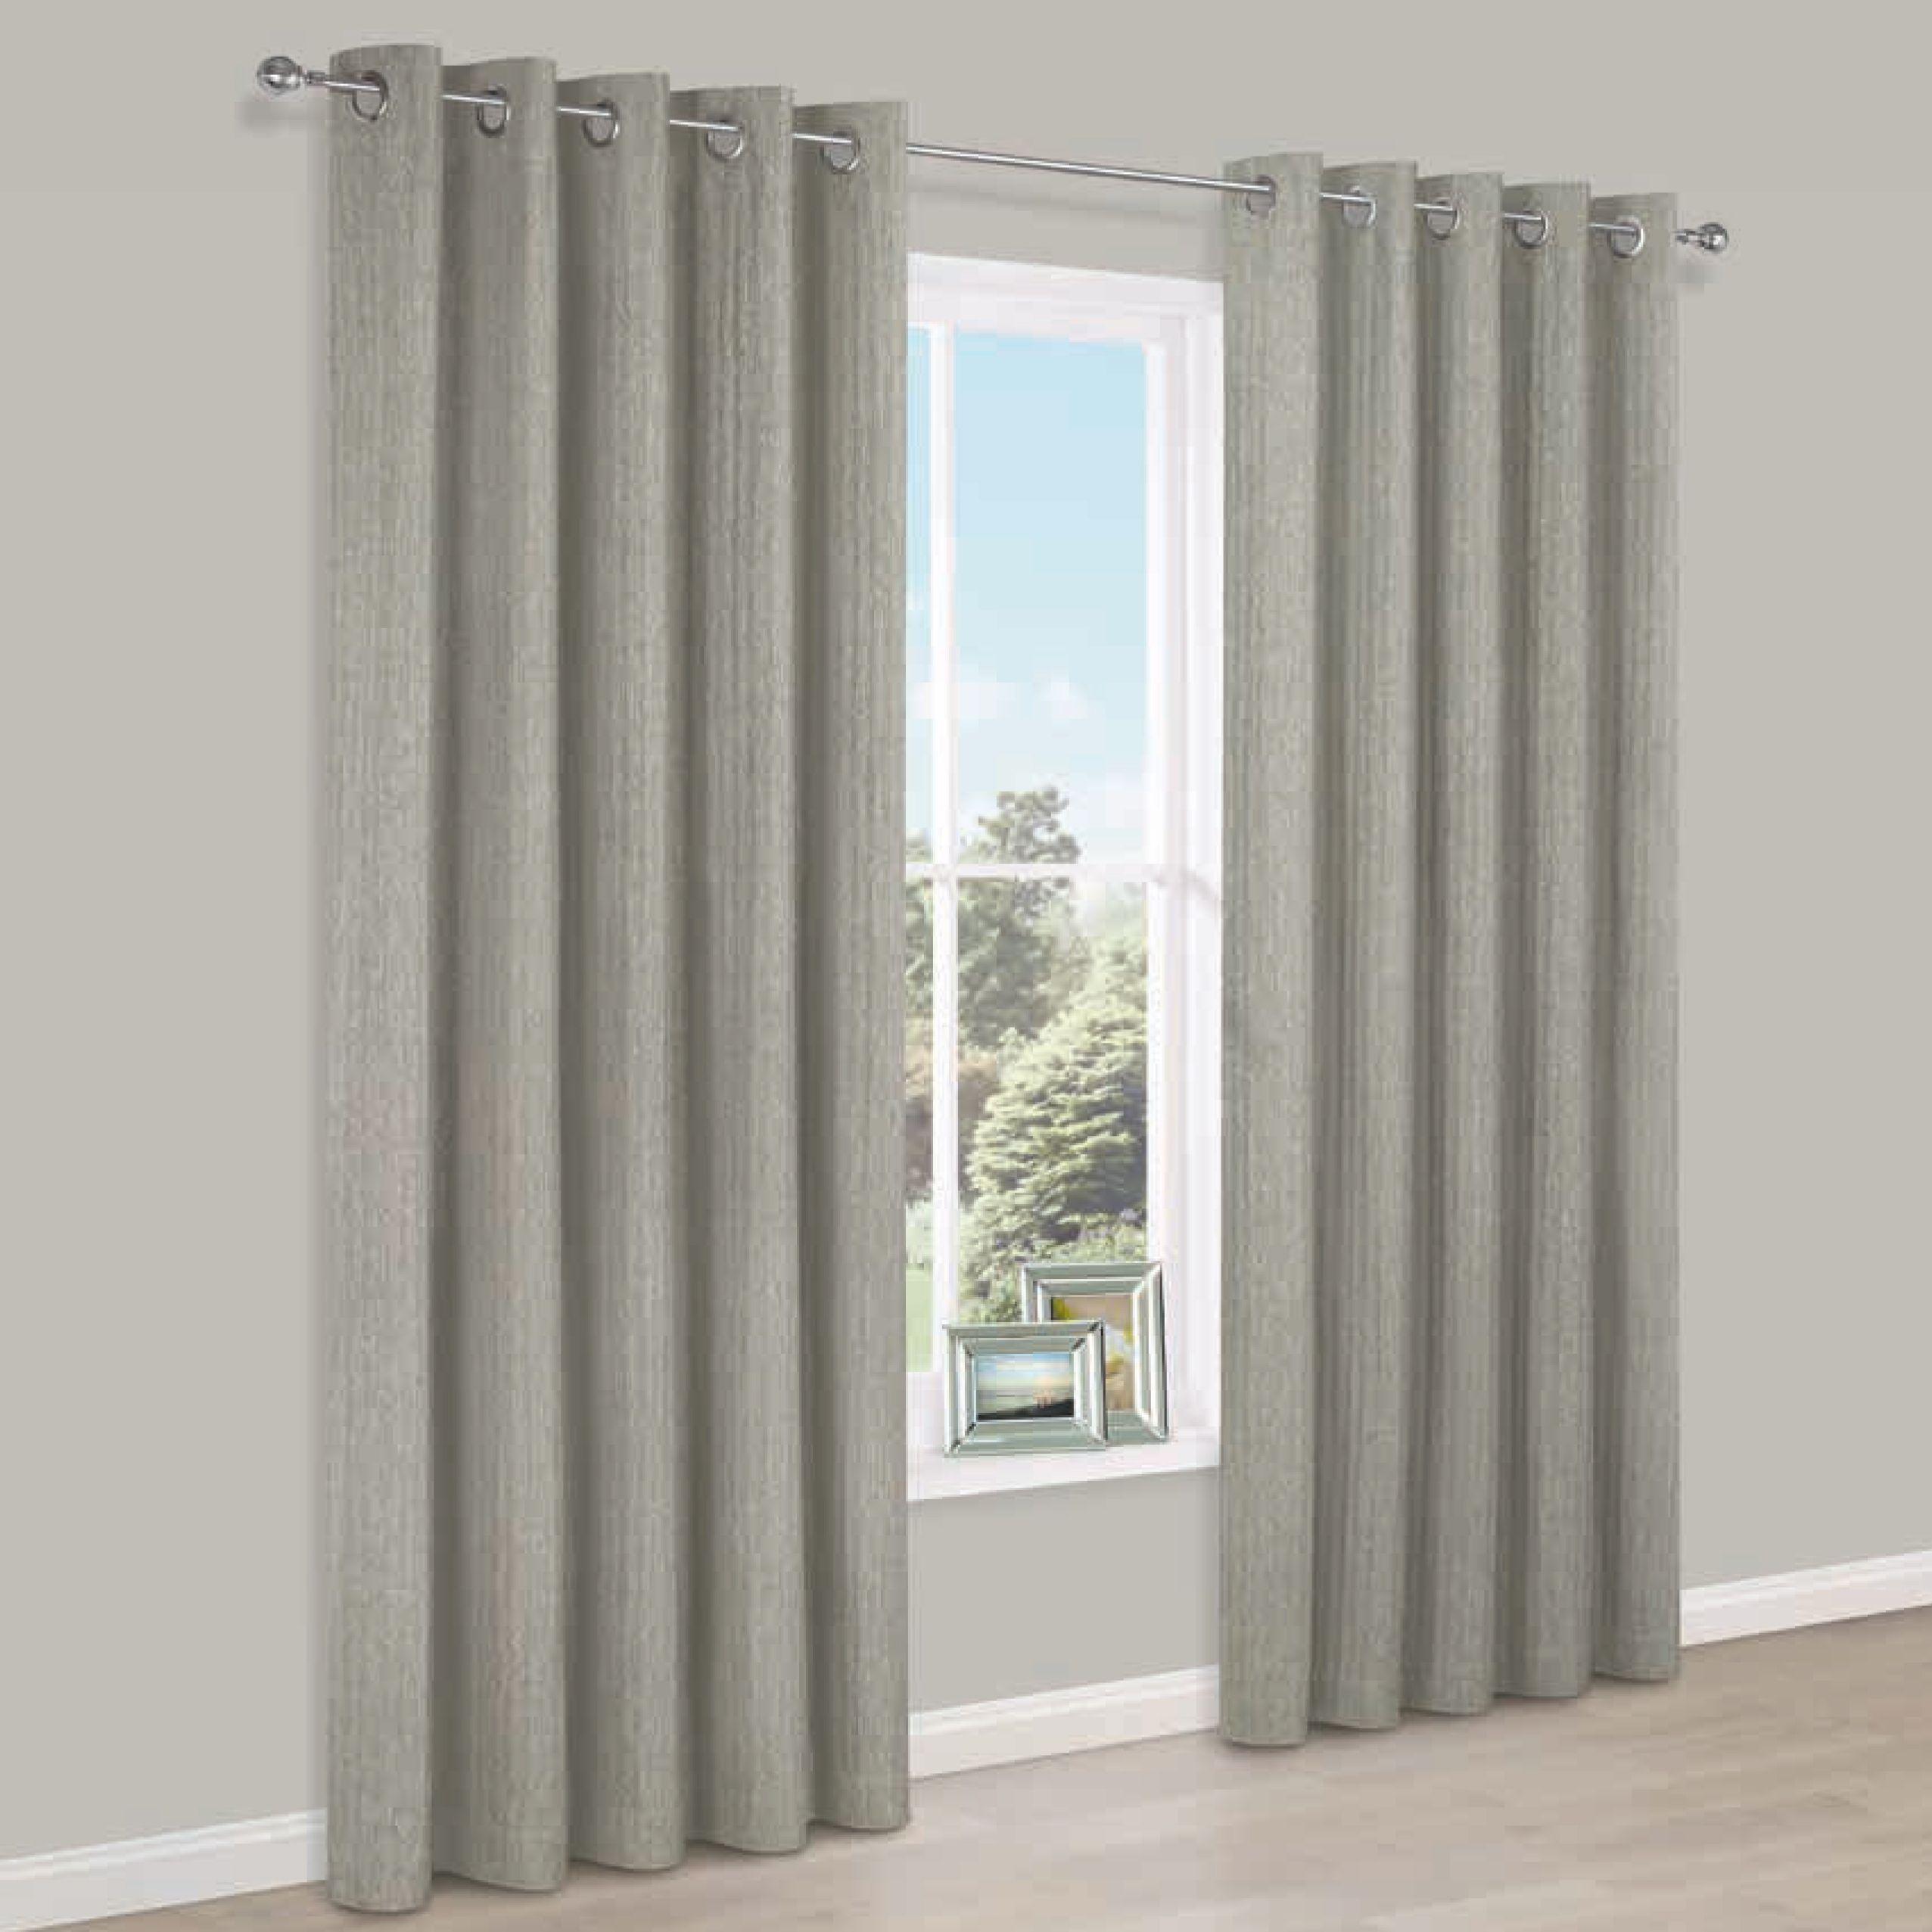 Joanna Beige Herringbone Woven Fabric Eyelet Lined Curtains (w)117 Cm (l)117 Cm